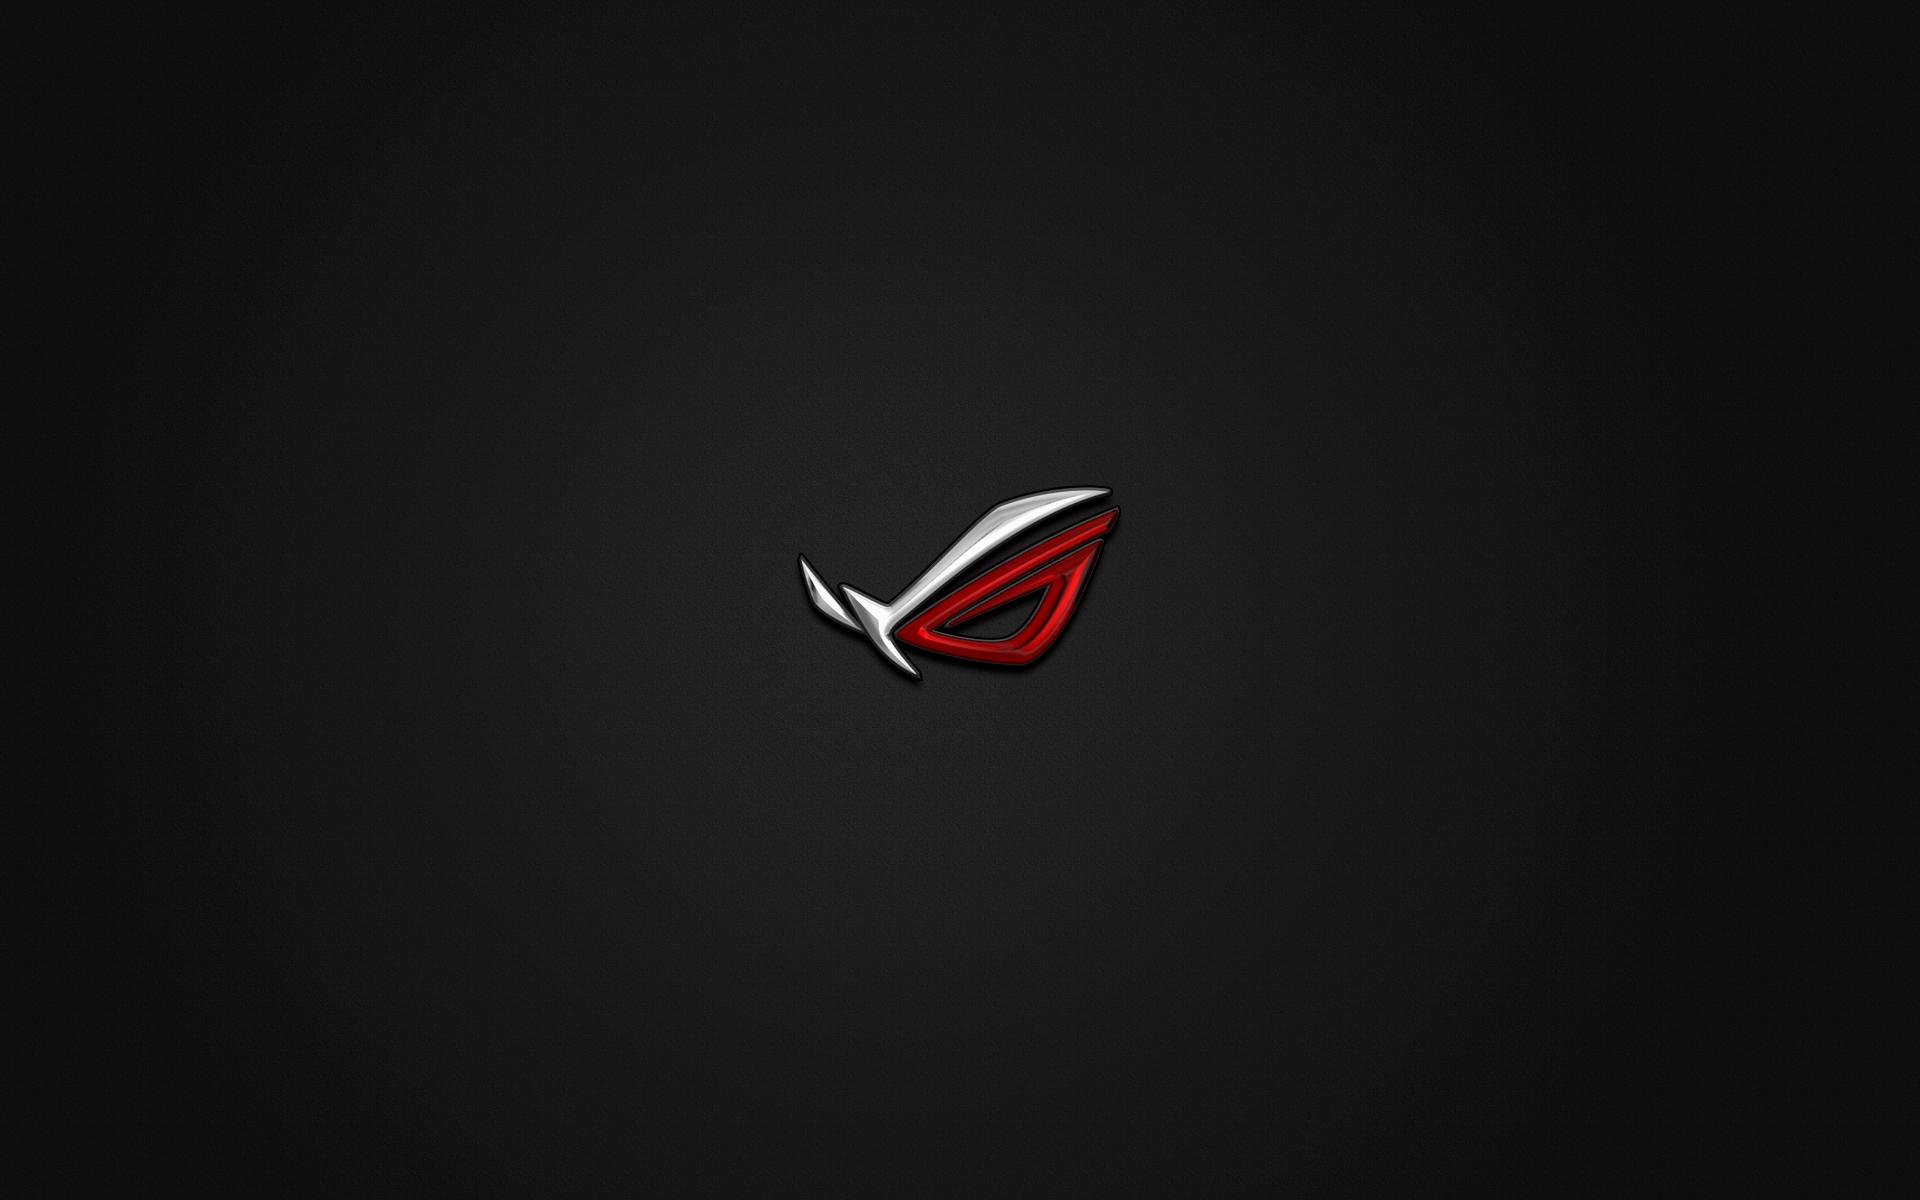 rog_red_chrome_by_mullet-d7u5rnl.jpg